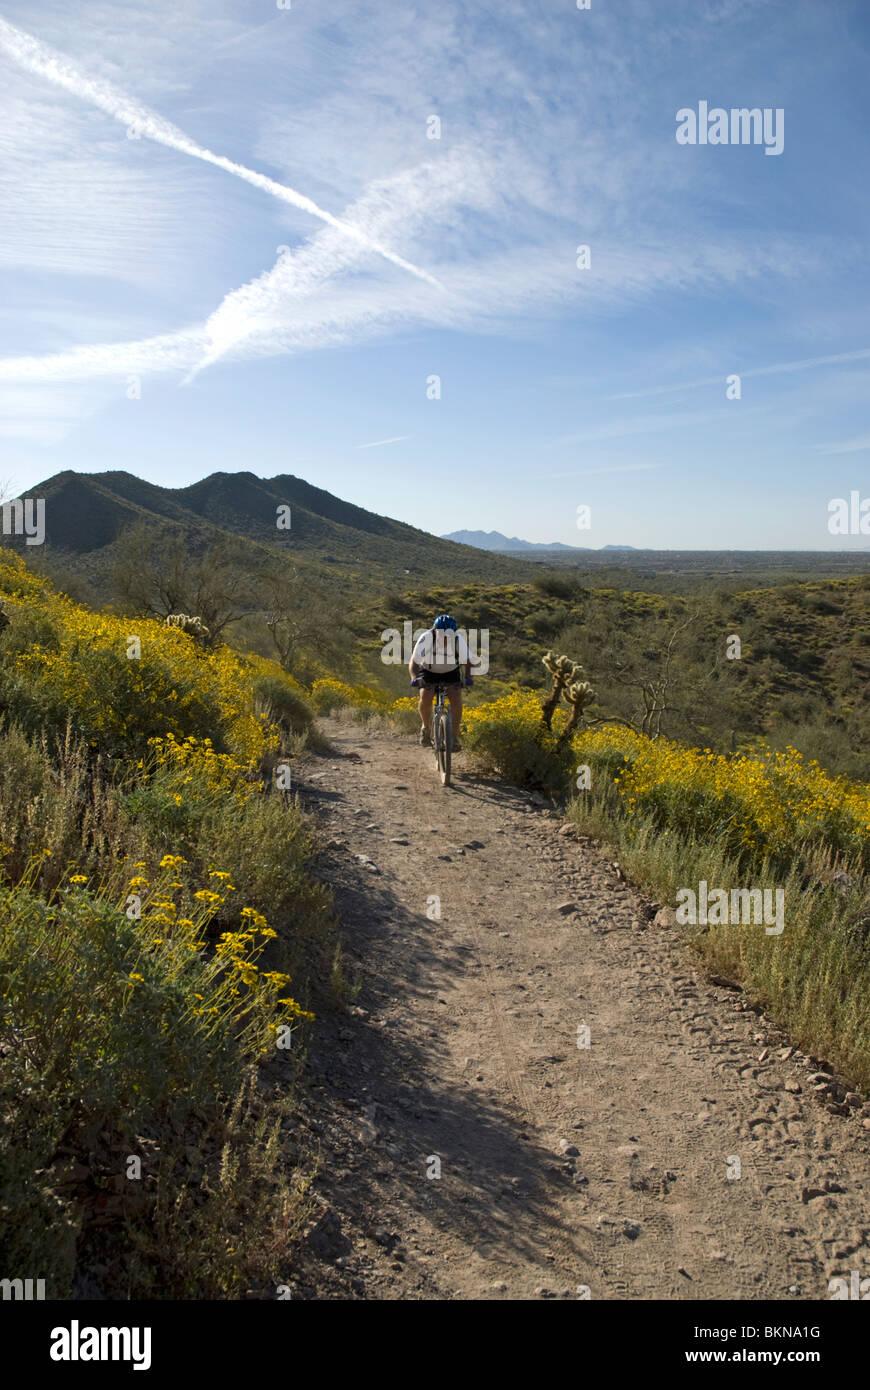 A mountain biker on a trail at Cave Creek Regional Park, Cave Creek, near Phoenix, Arizona, USA - Stock Image